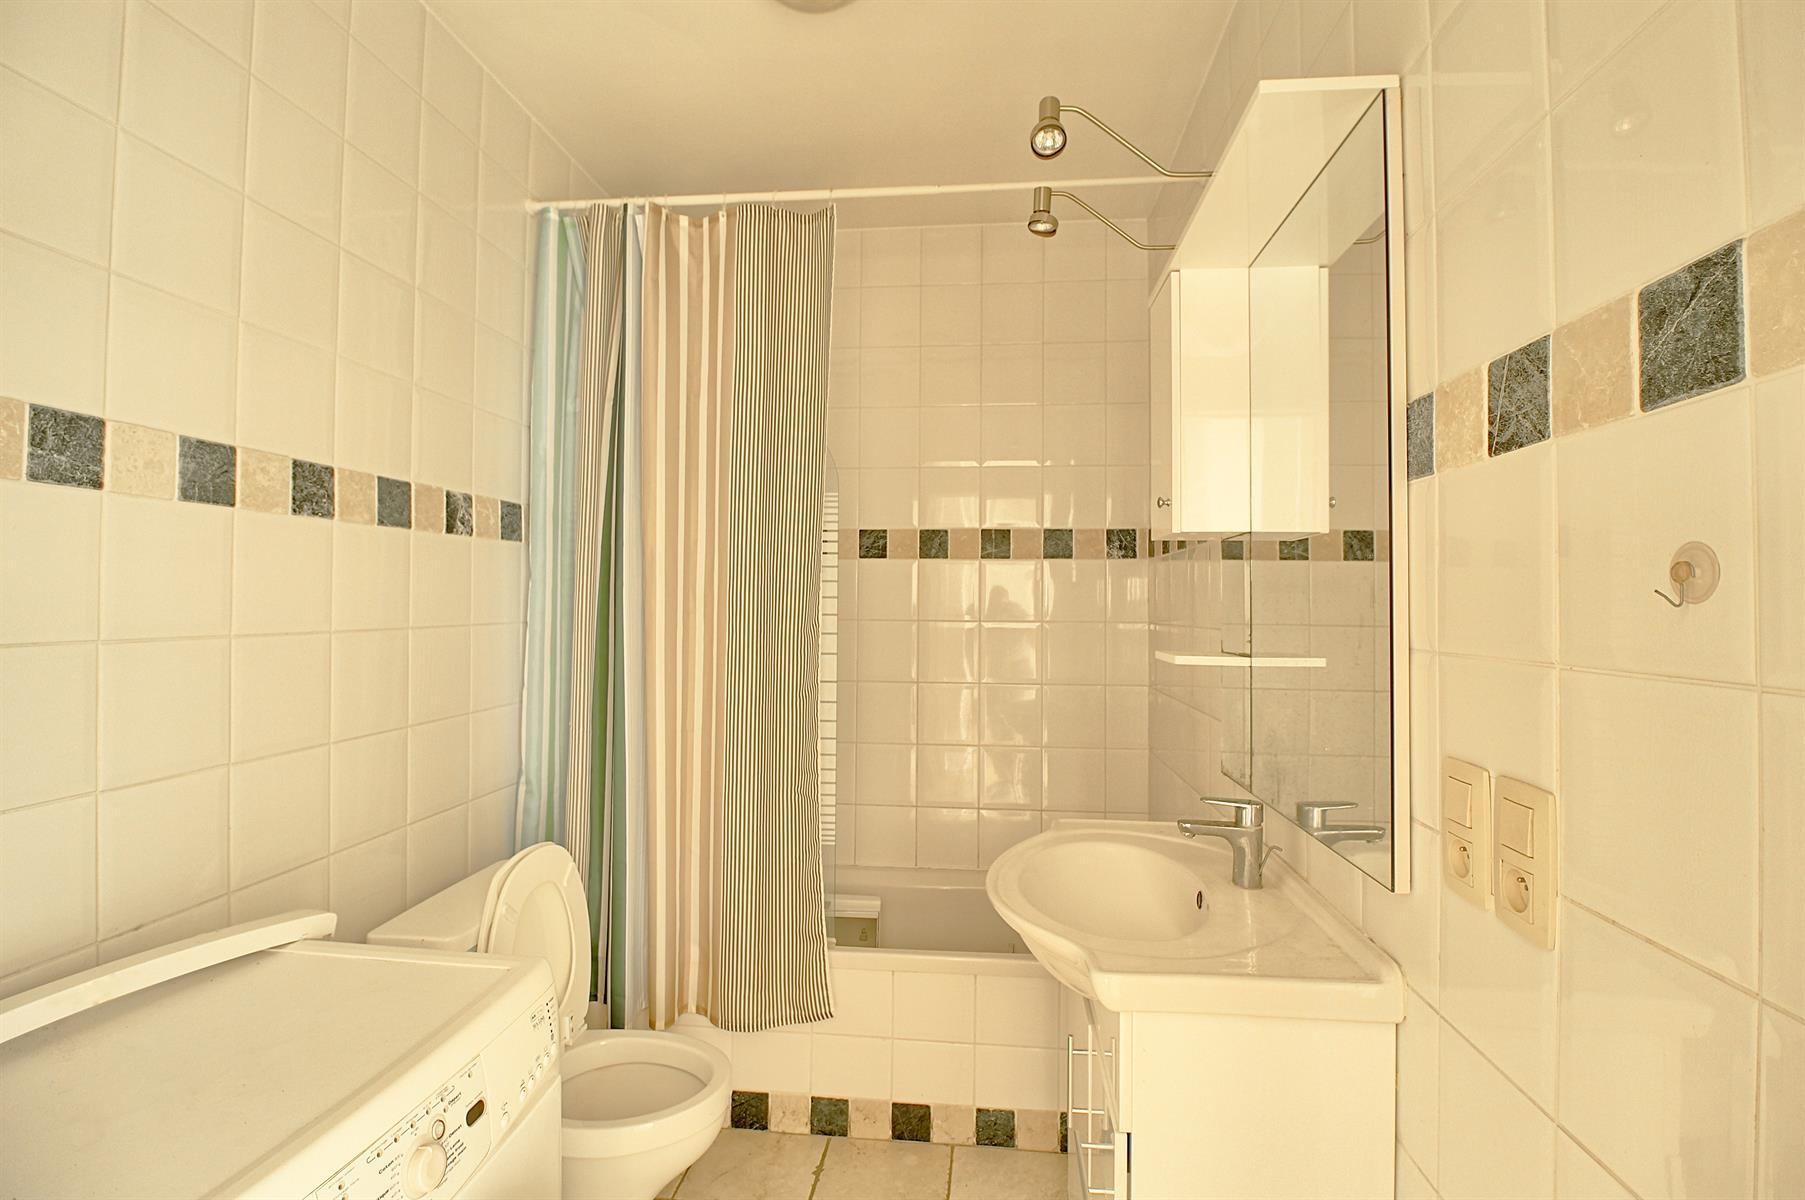 Appartement - Woluwe-Saint-Lambert - #4180127-7